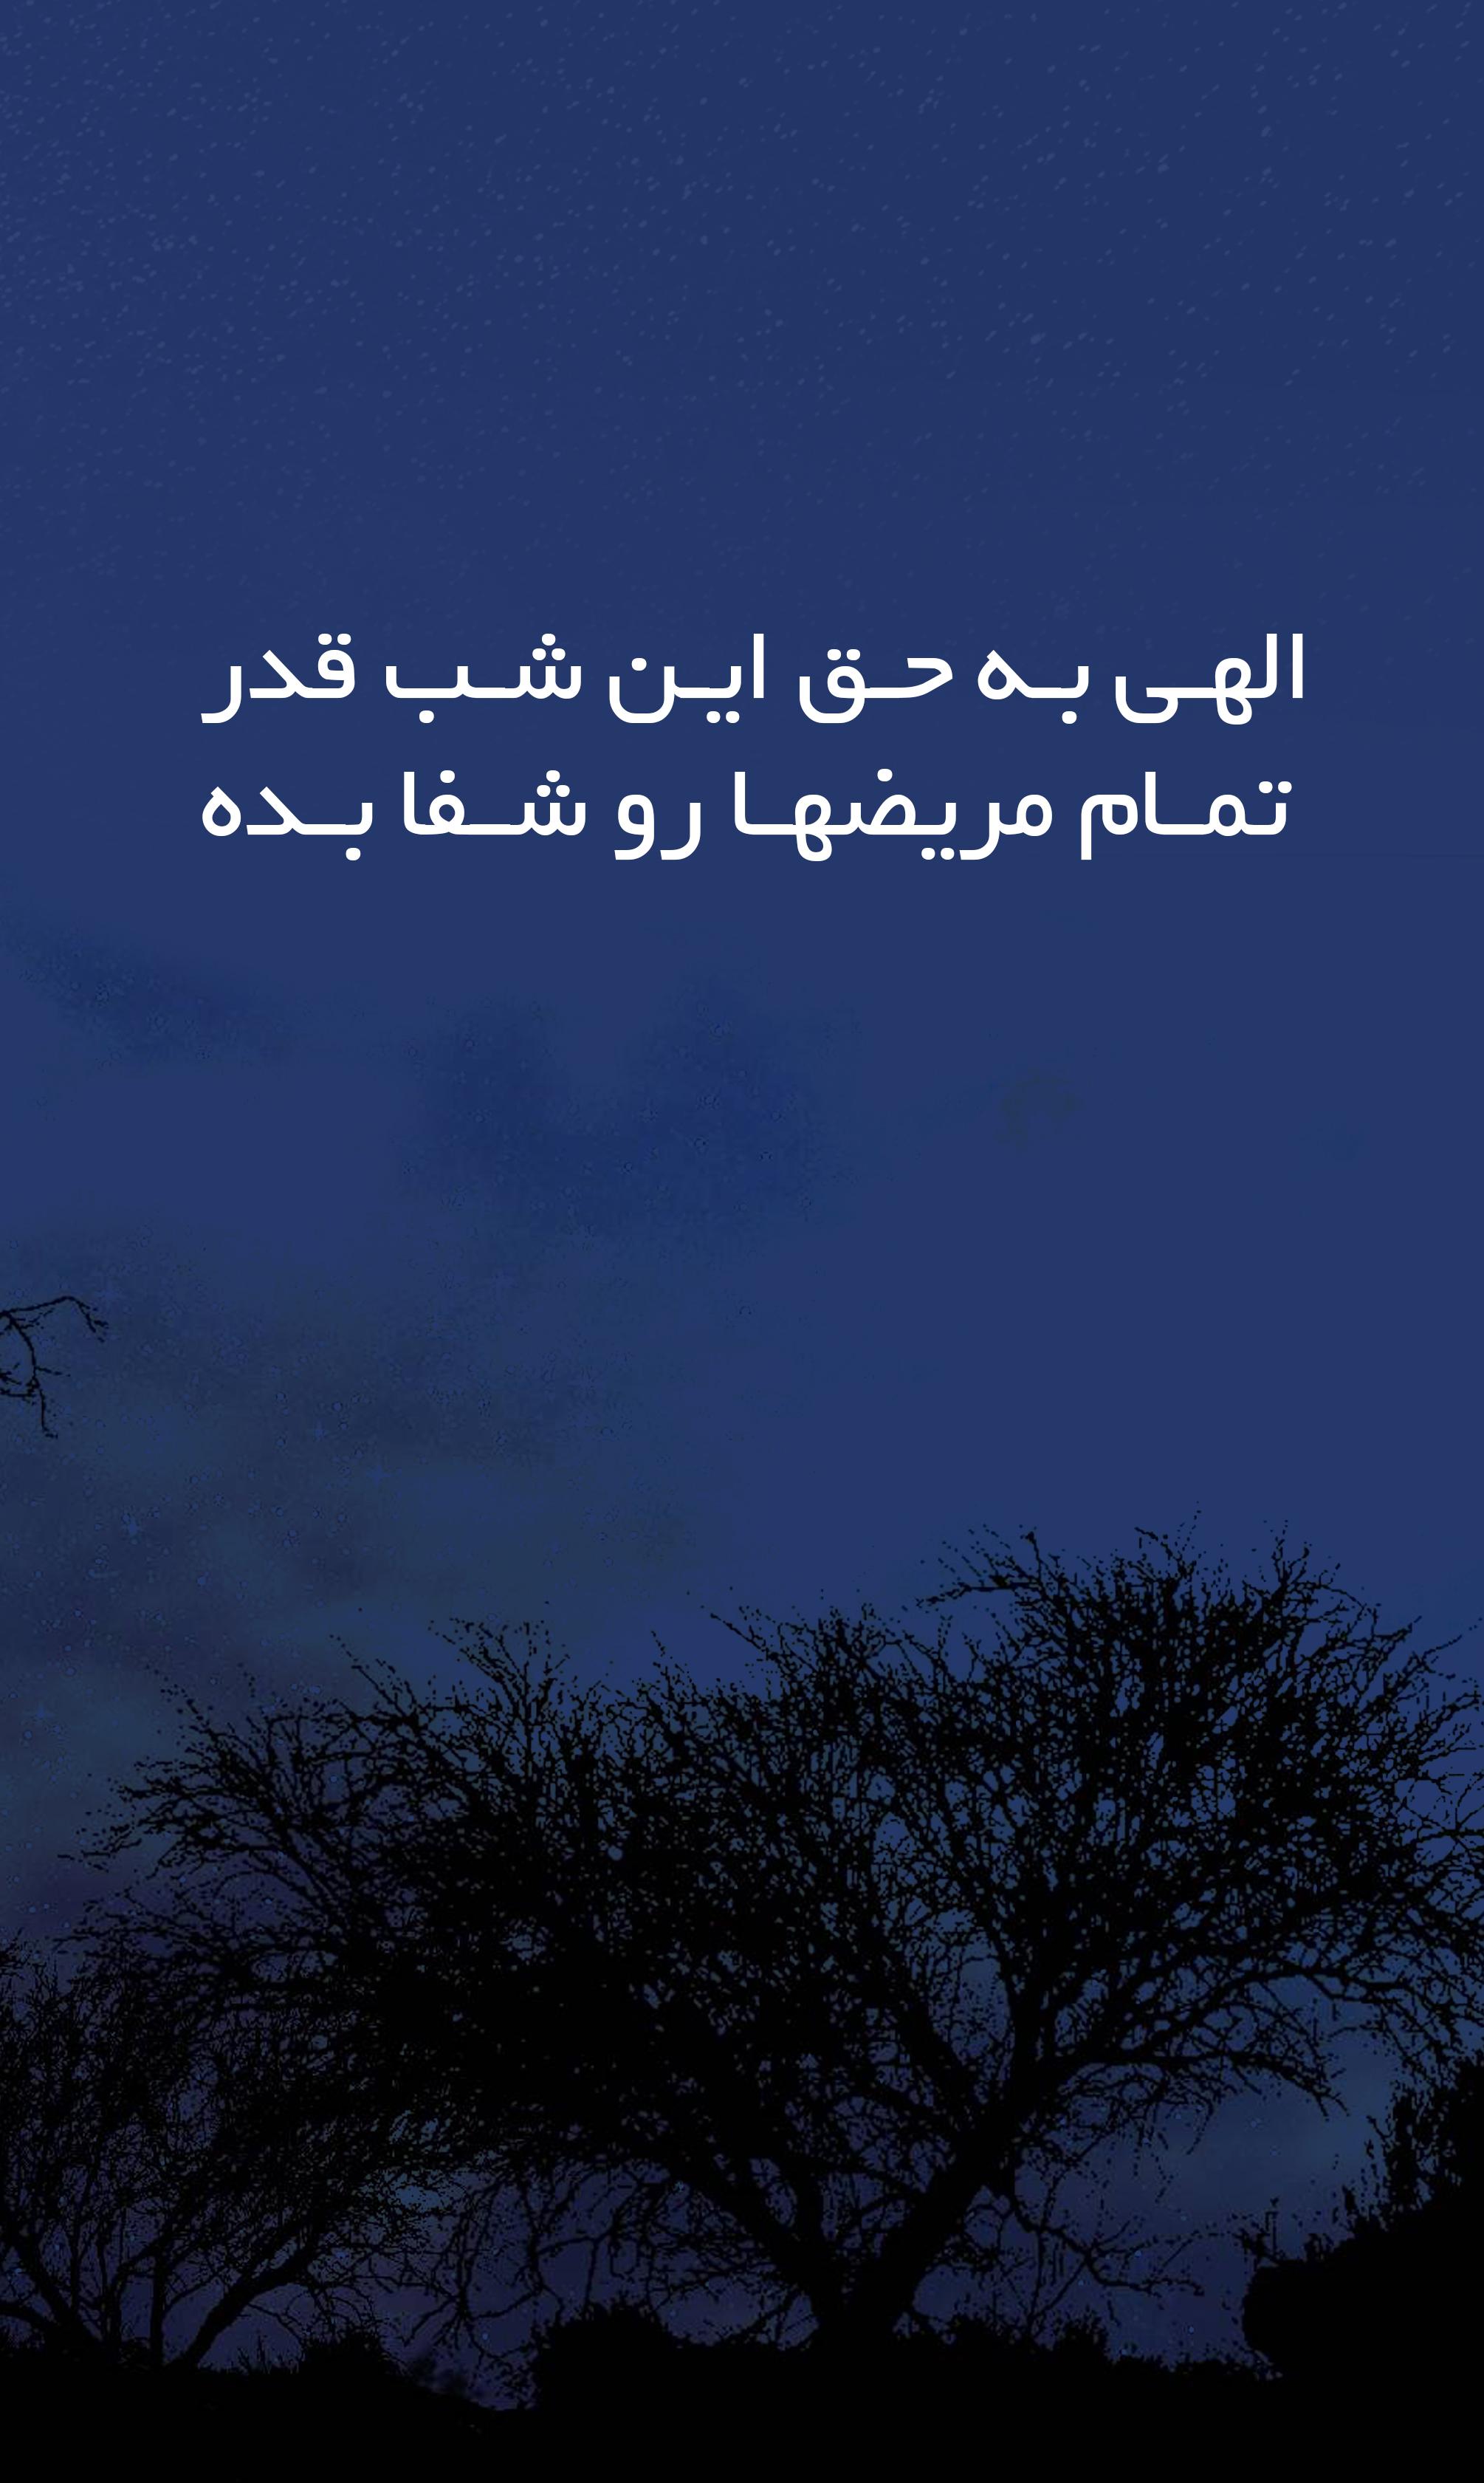 پوستر شب قدر استوری شب قدر پوستر التماس دعا